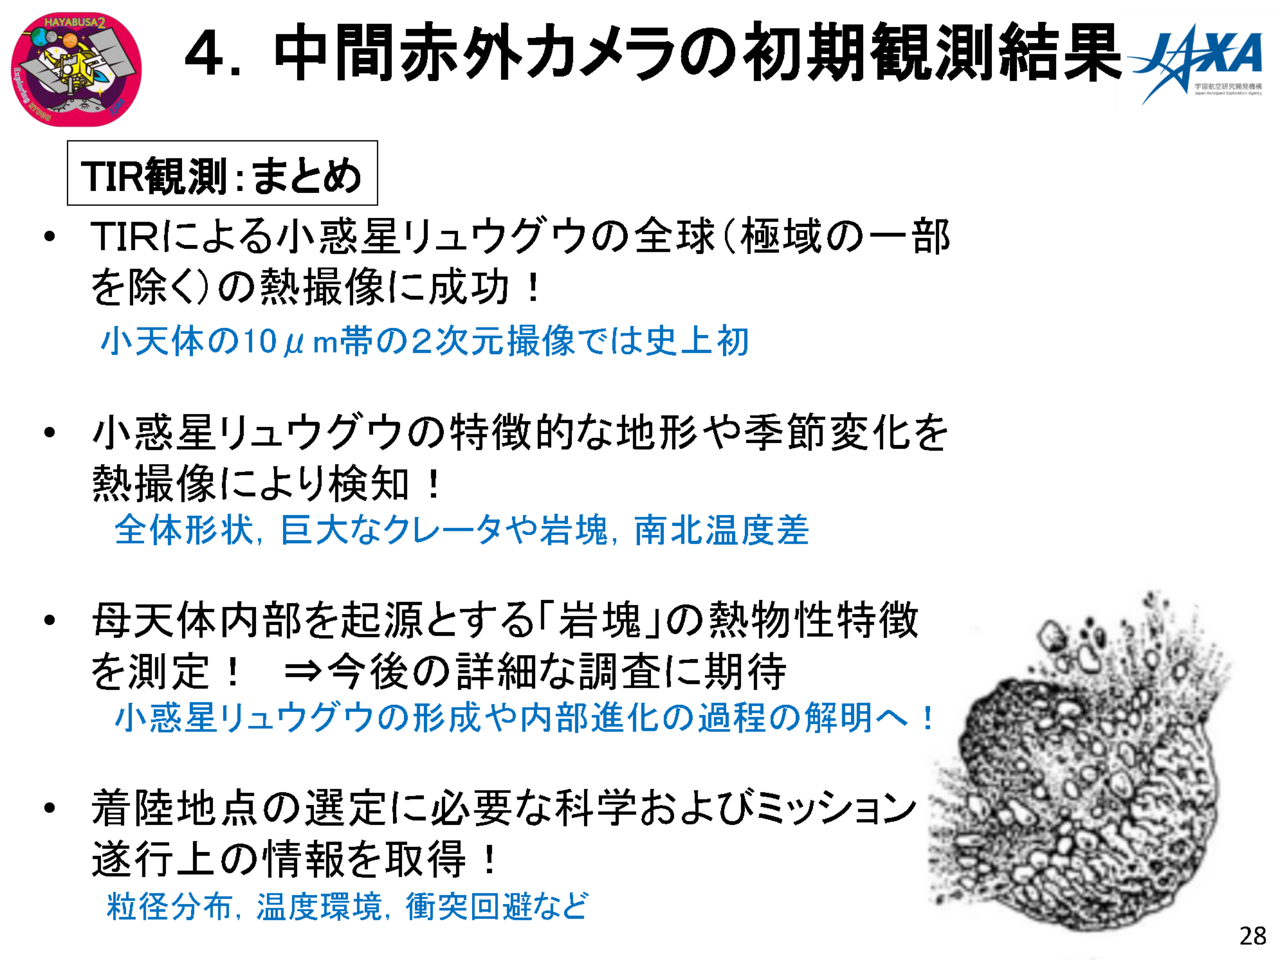 f:id:Imamura:20180719131723p:plain